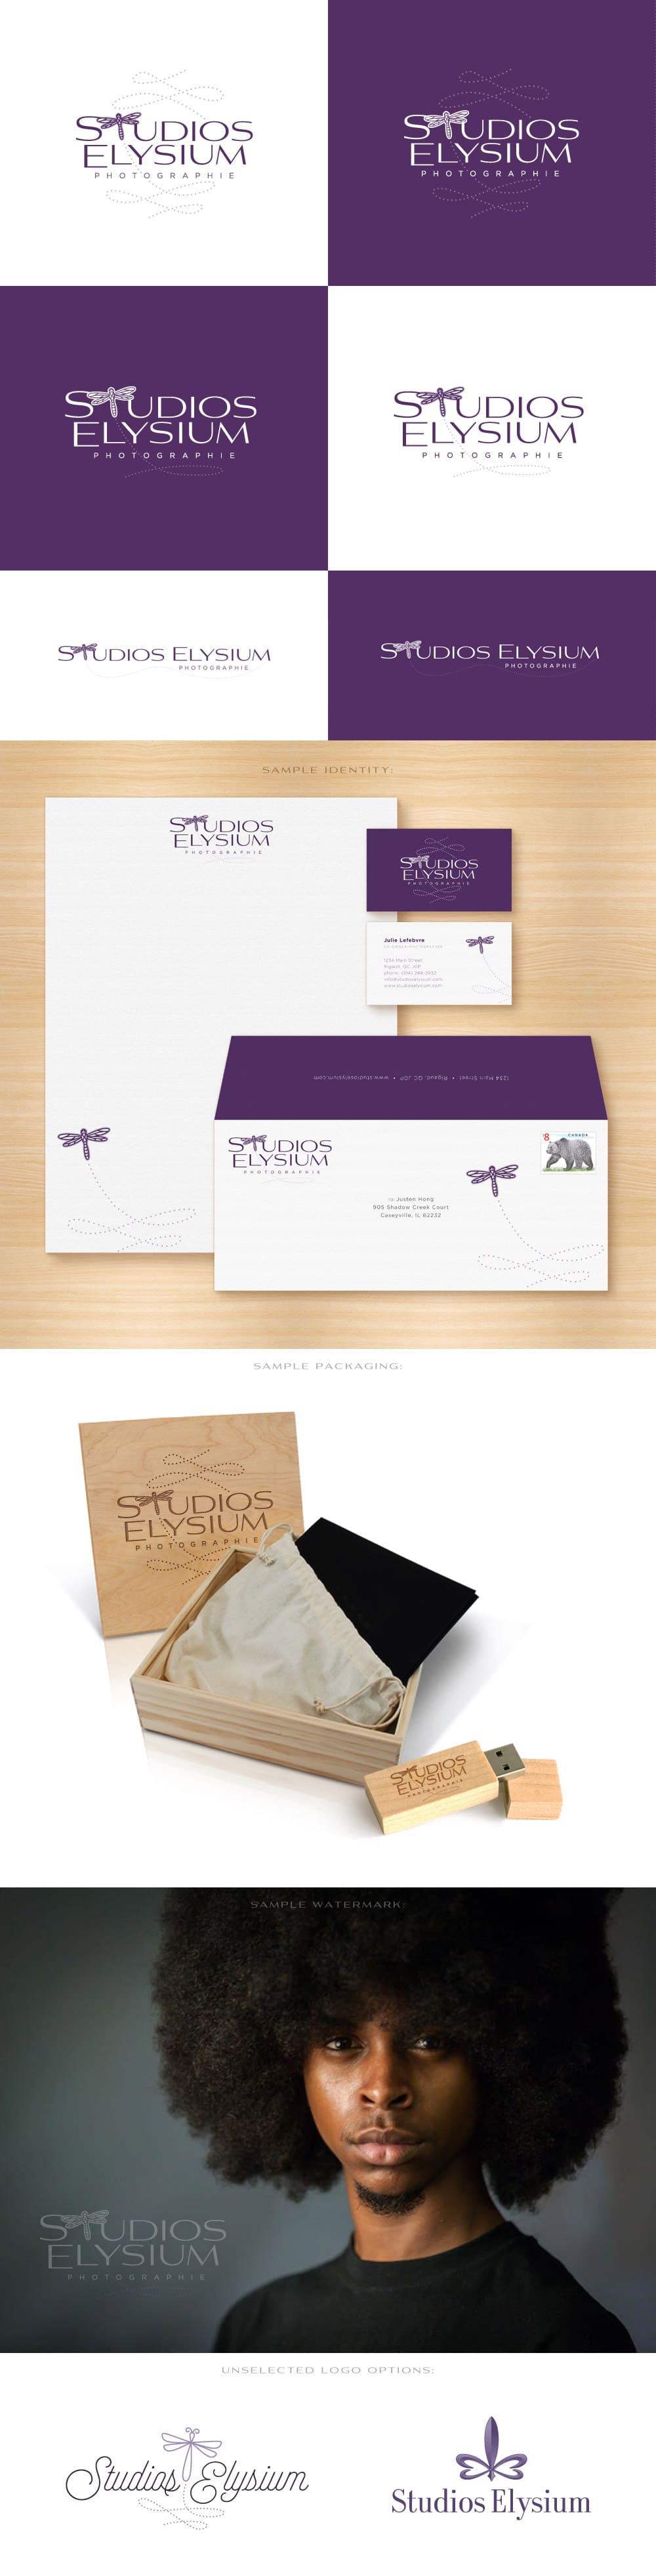 Studios Elysium logo design branding